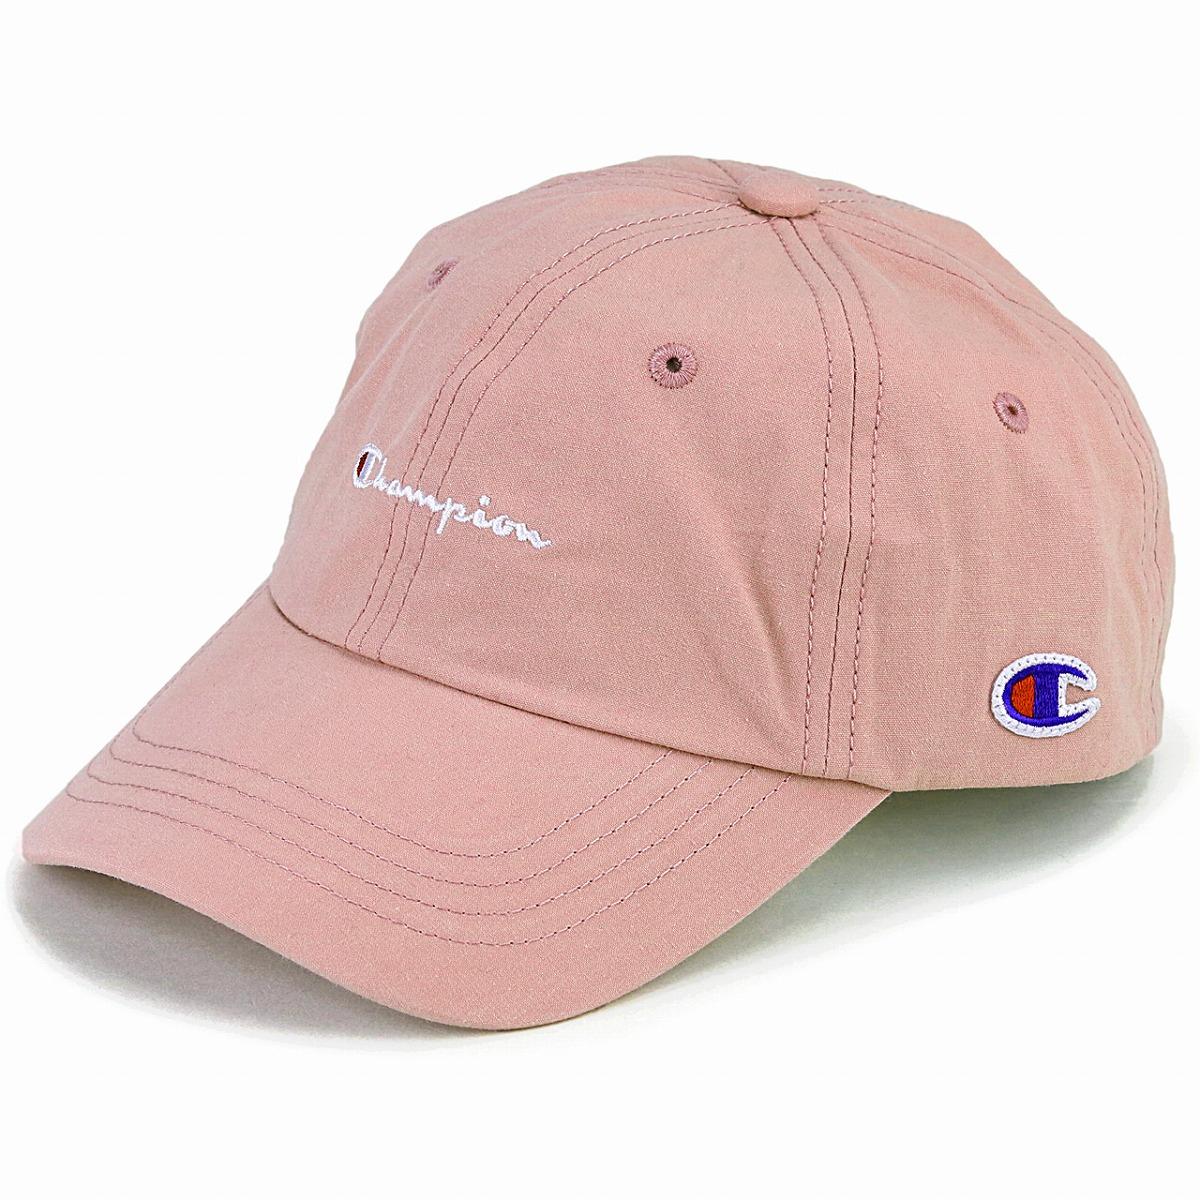 20ba6b1ea10 ELEHELM HAT STORE    pink  baseball cap  birthday present Christmas gift  lapping for free that a Champion cap Lady s champion logo cap men thunk  pull low ...